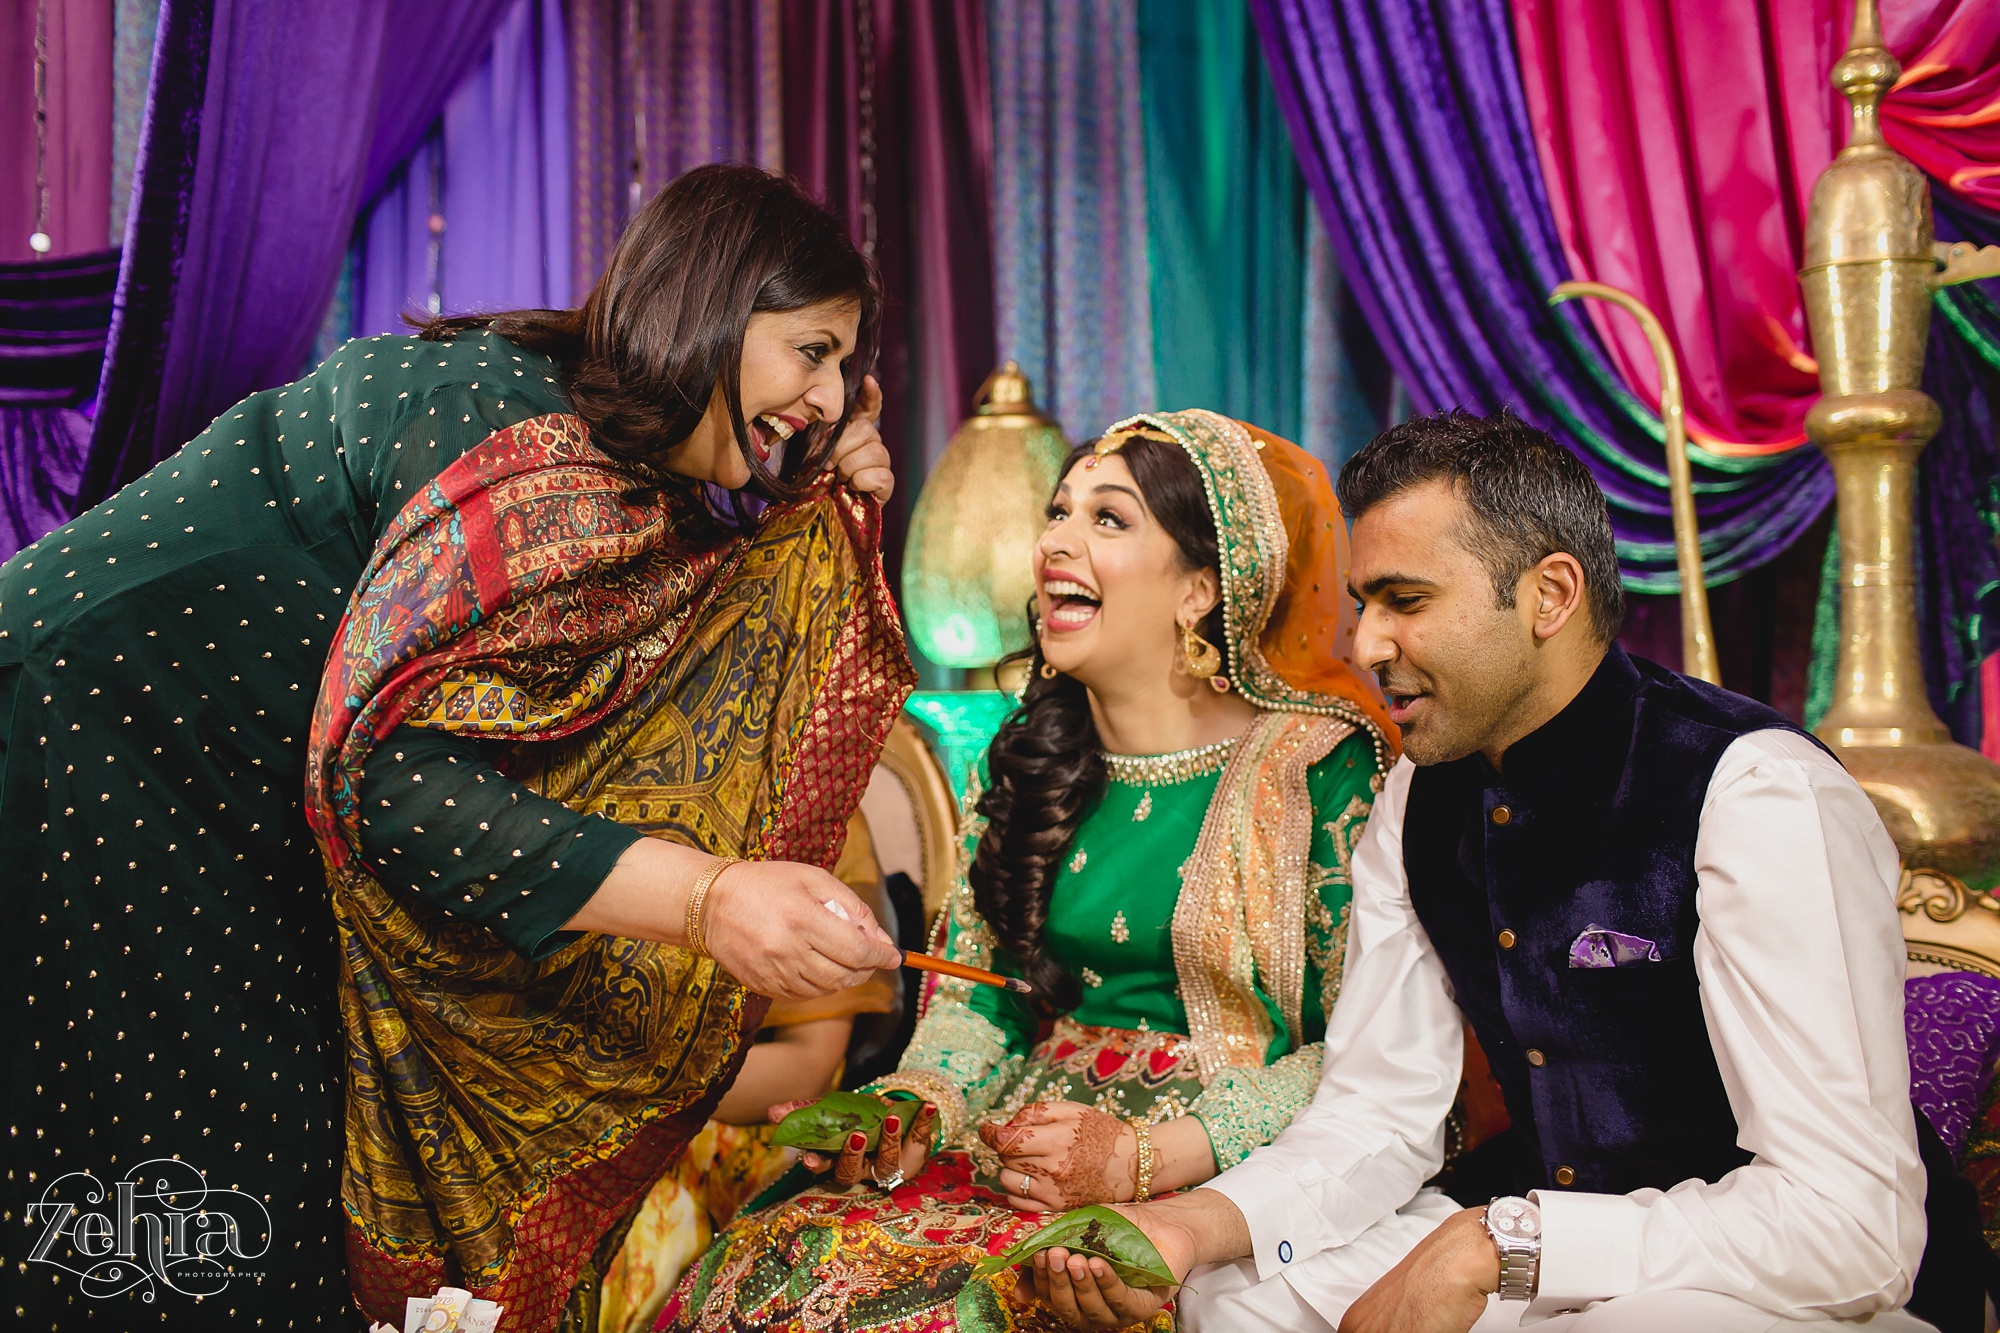 zehra wedding photographer arley hall cheshire037.jpg